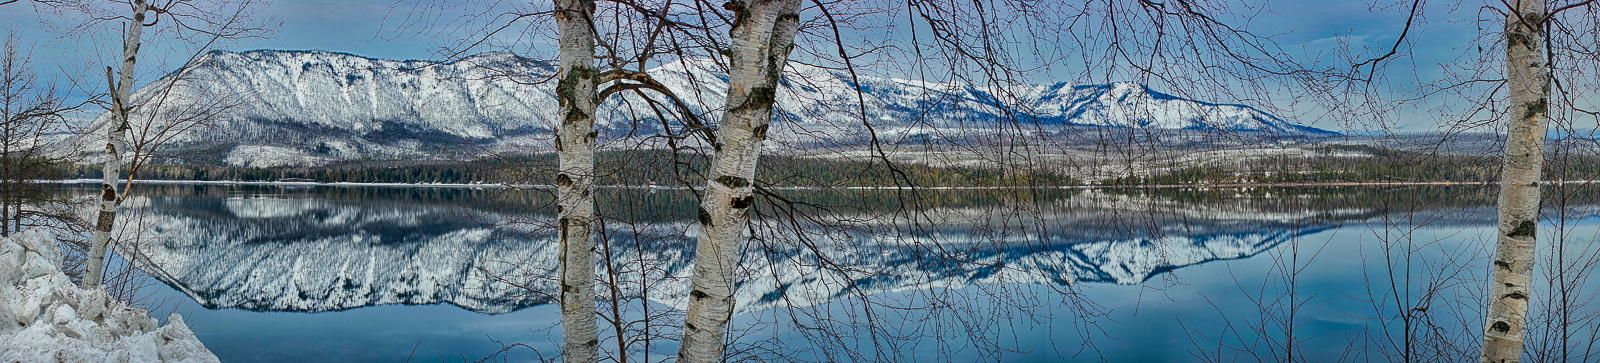 Beyond the trees, Lake McDonald by Simon Chandler on 500px